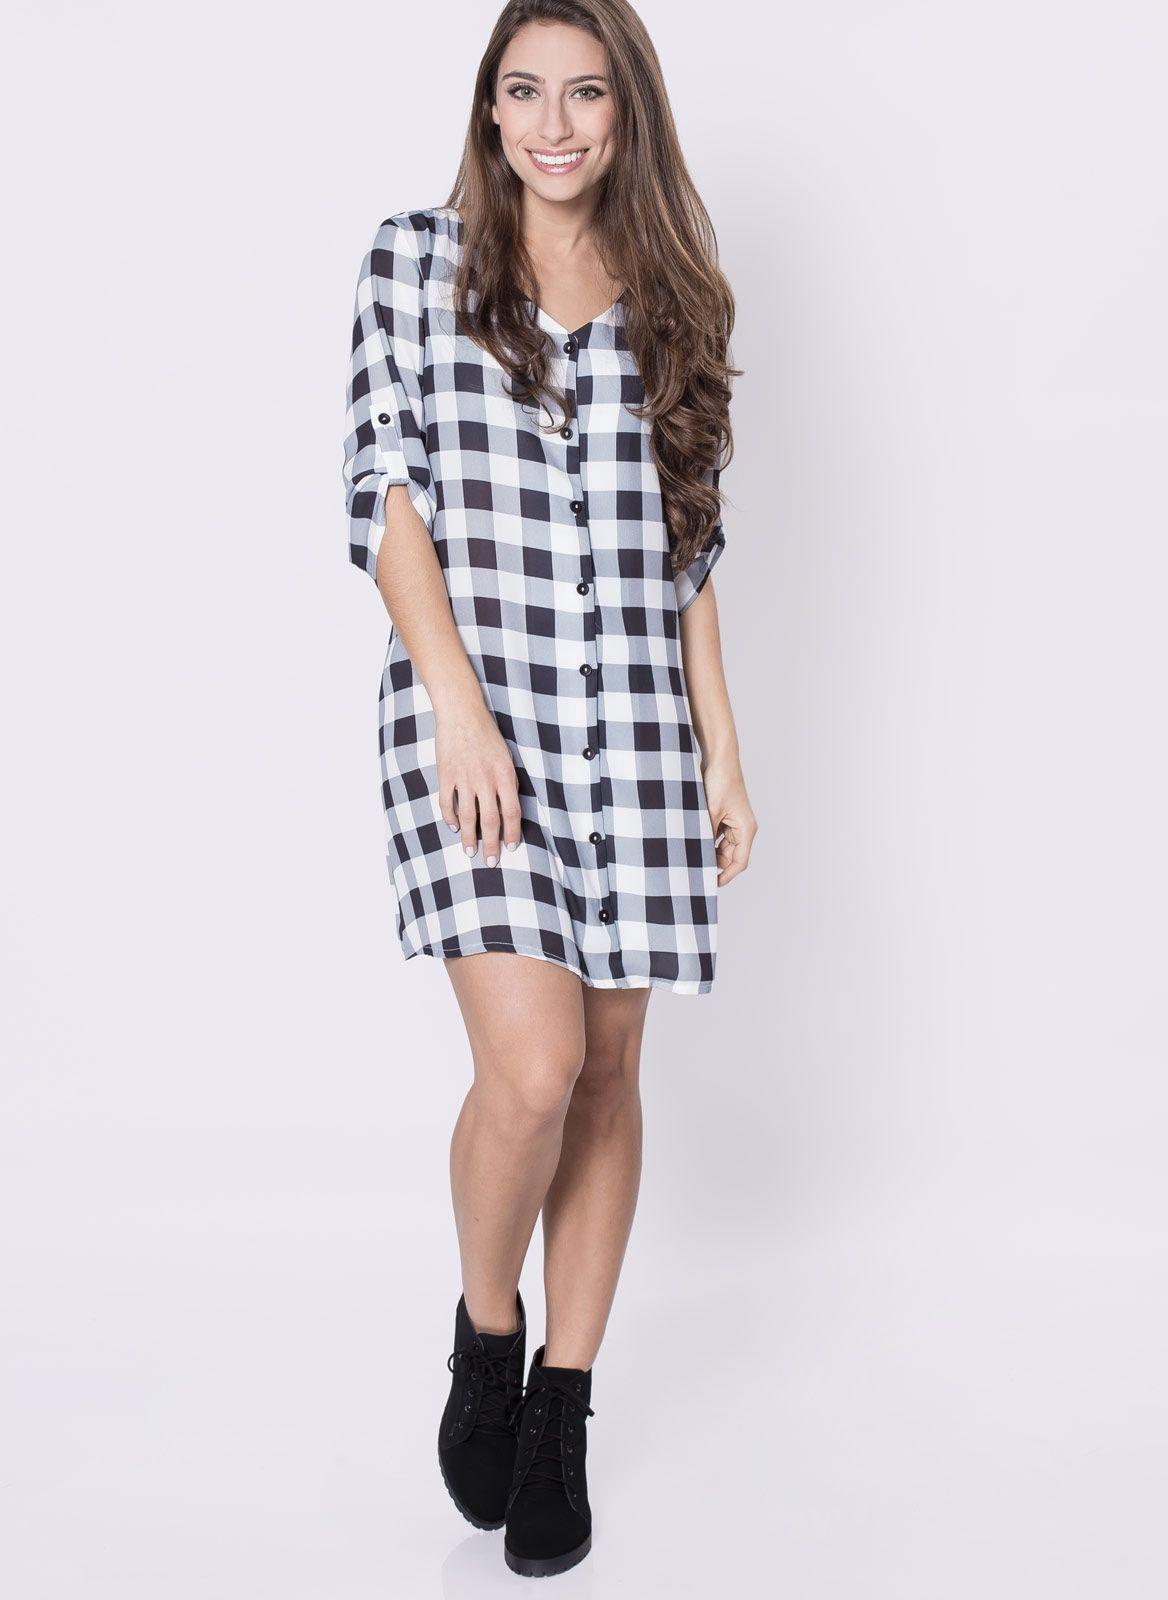 84f73d4fd Vestido Chemise Xadrez | P/ MAINHA - COSTURA | Vestido chemise ...